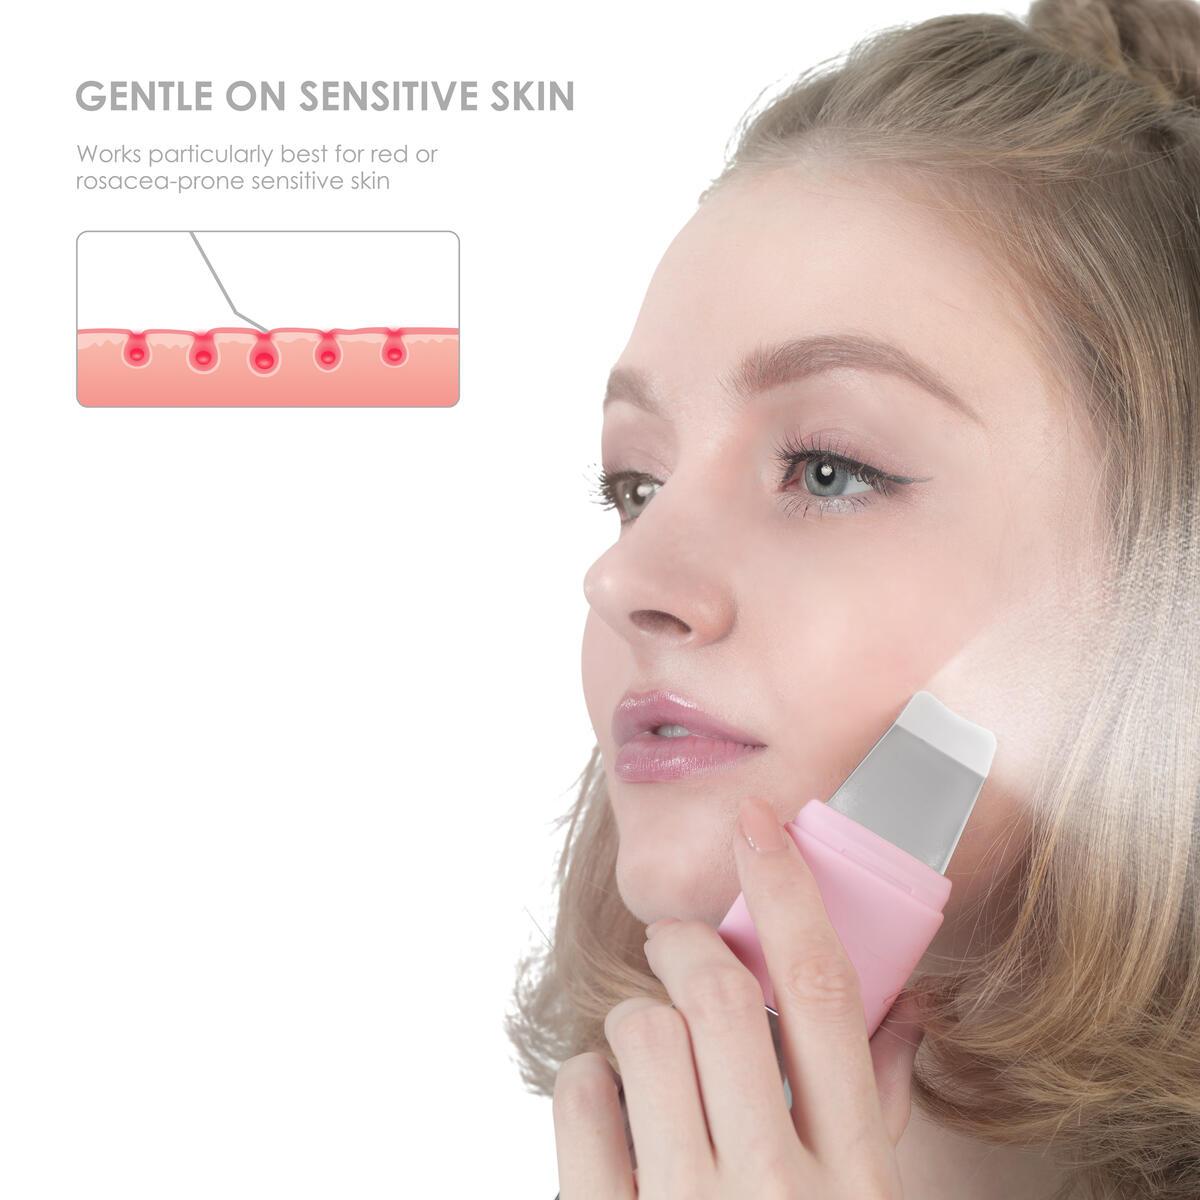 ($118 Value) SVK KANDICE Ultrasonic Skin Scrubber Face Scrubber